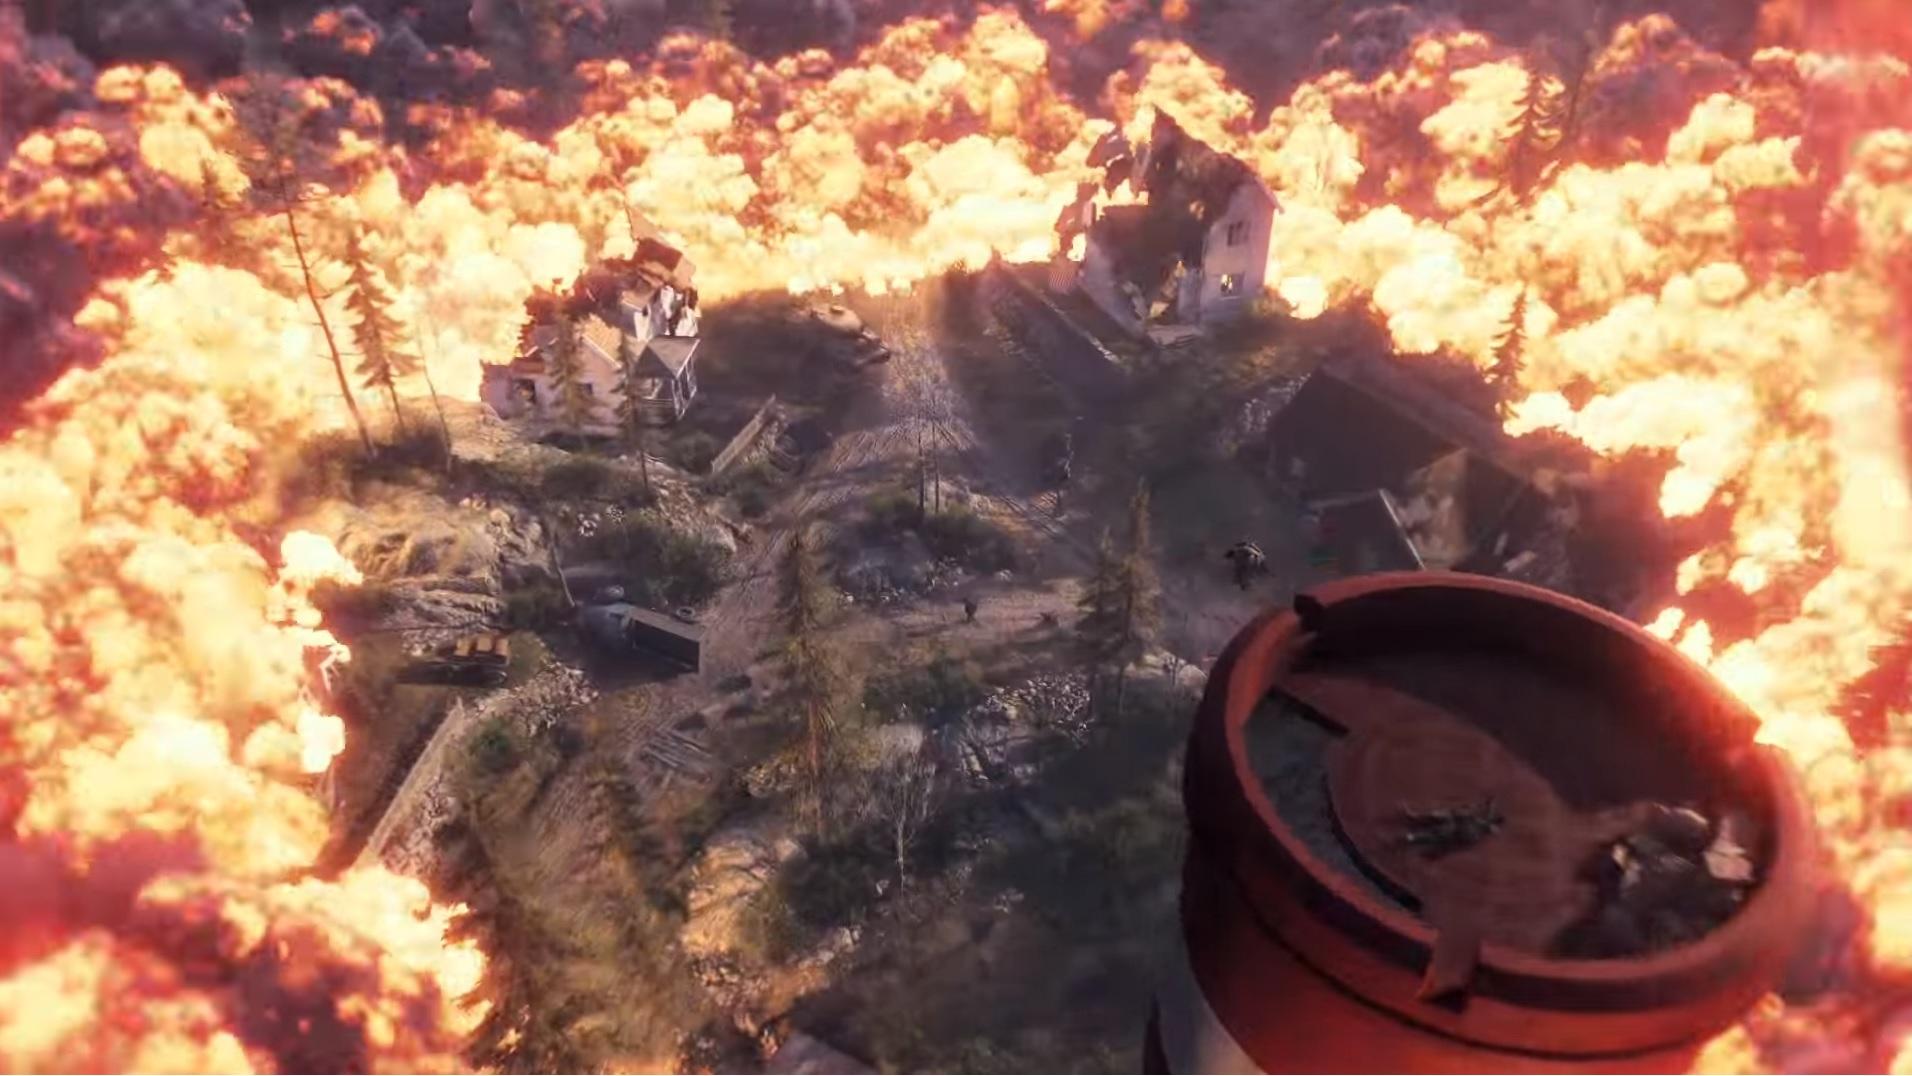 new battlefield trailer